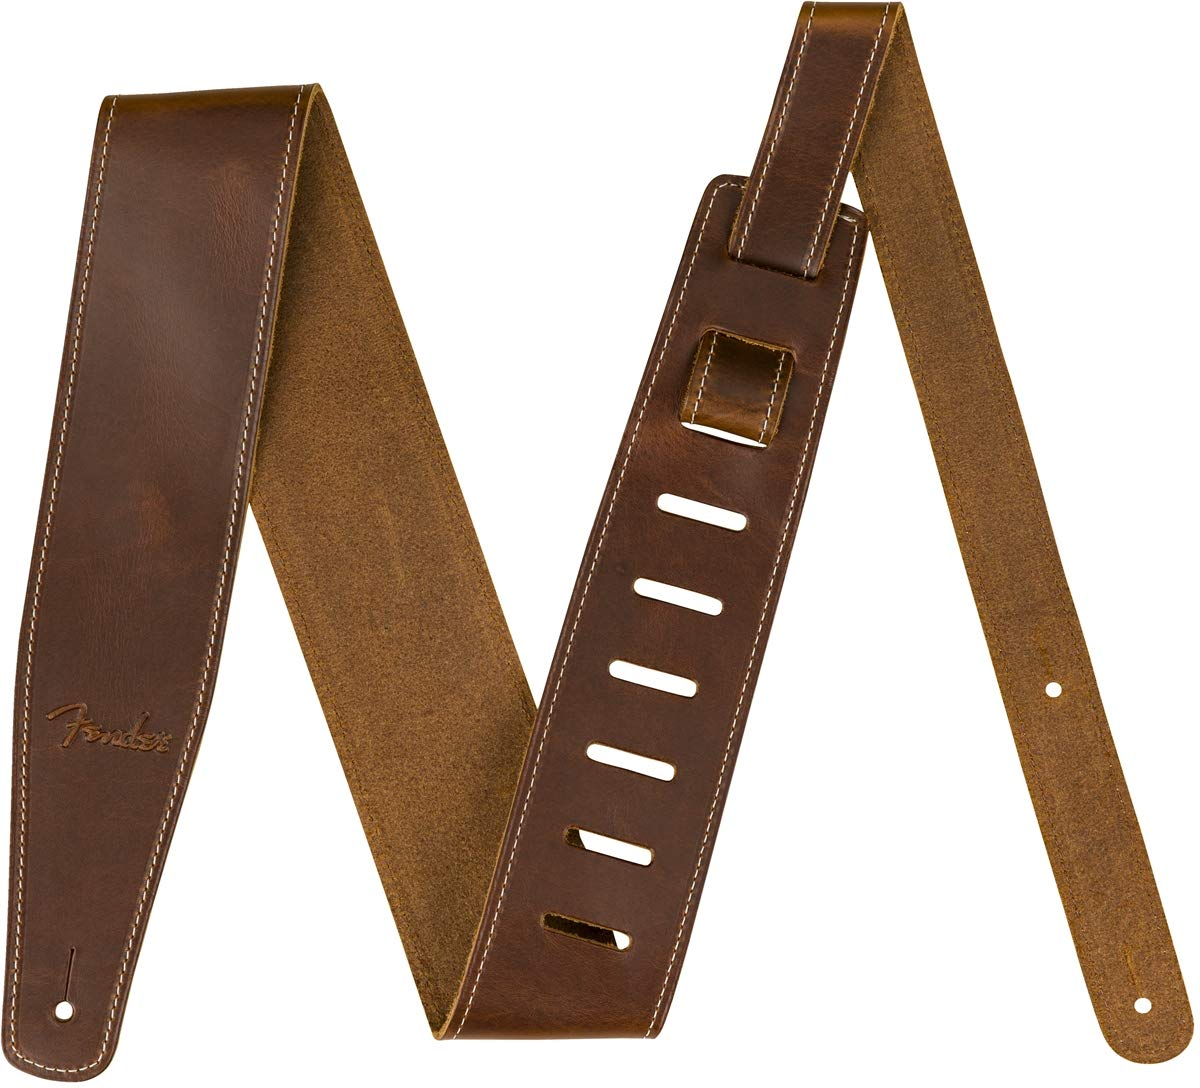 Fender Broken-In Leather Strap, Brown 2.5'' by Fender